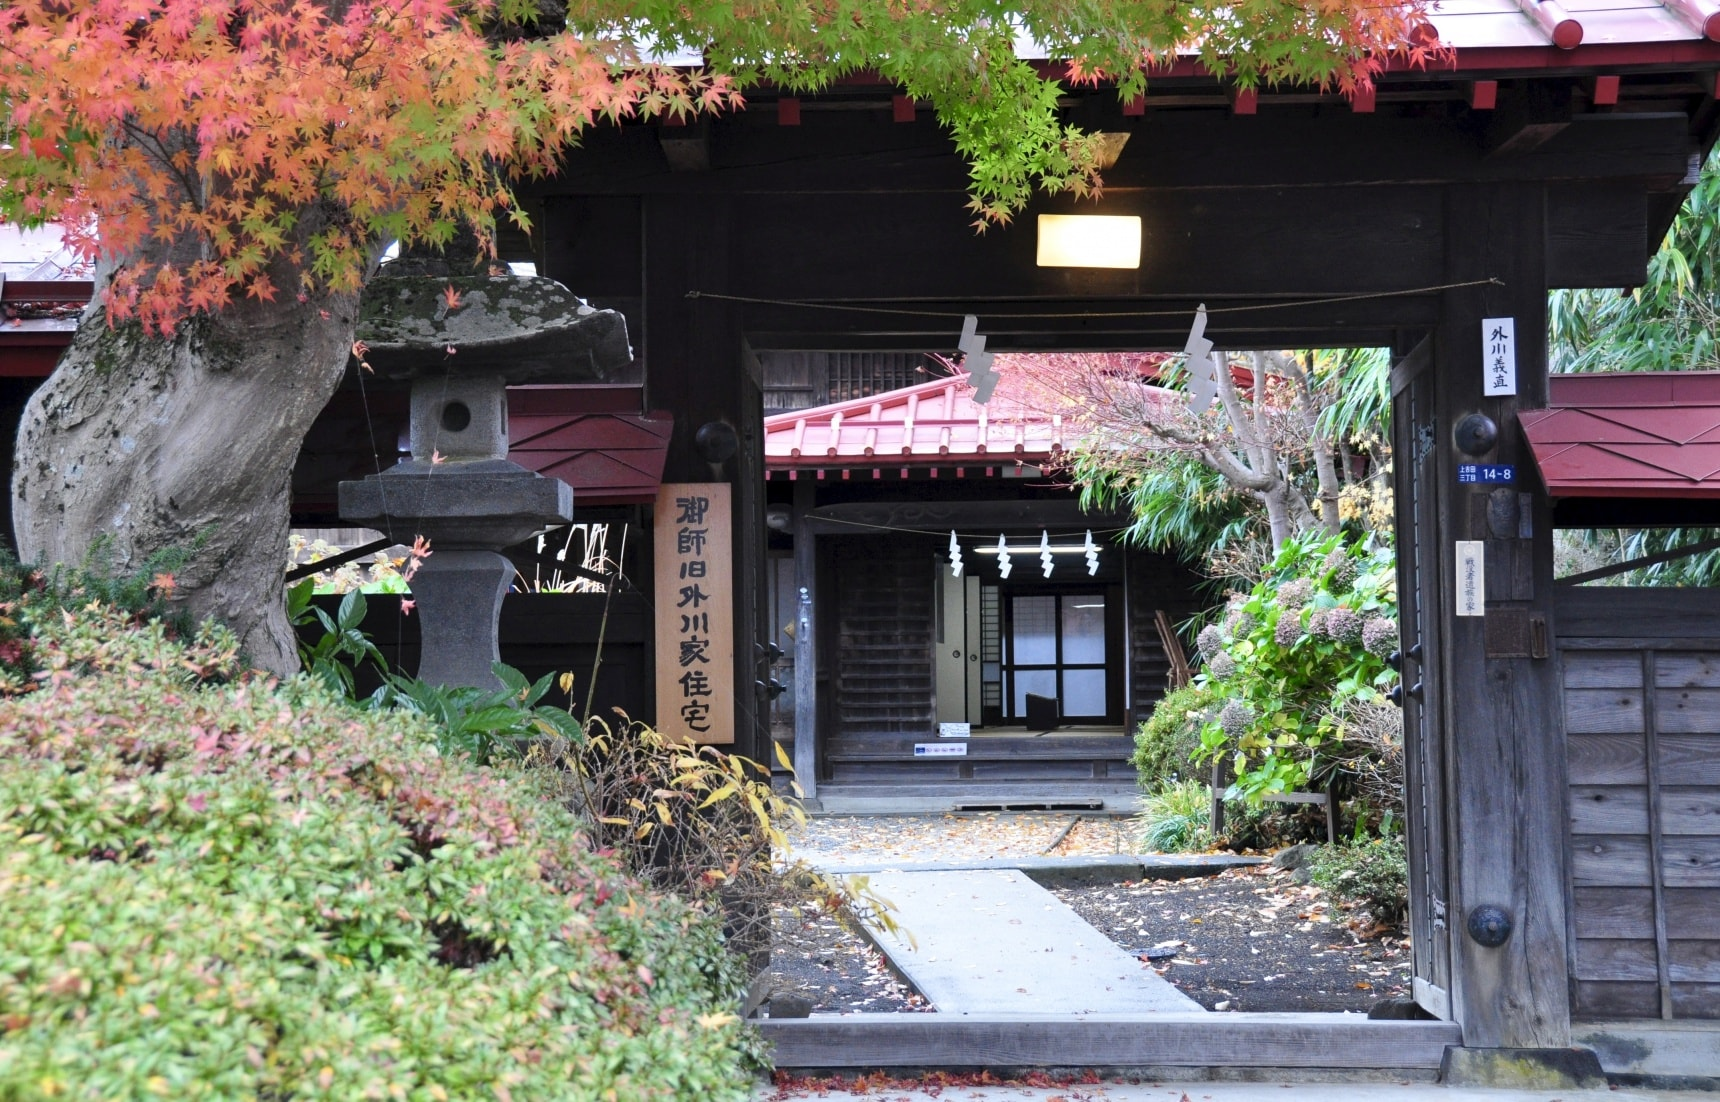 Togawa Oshi House: Lodging for Fuji Pilgrims